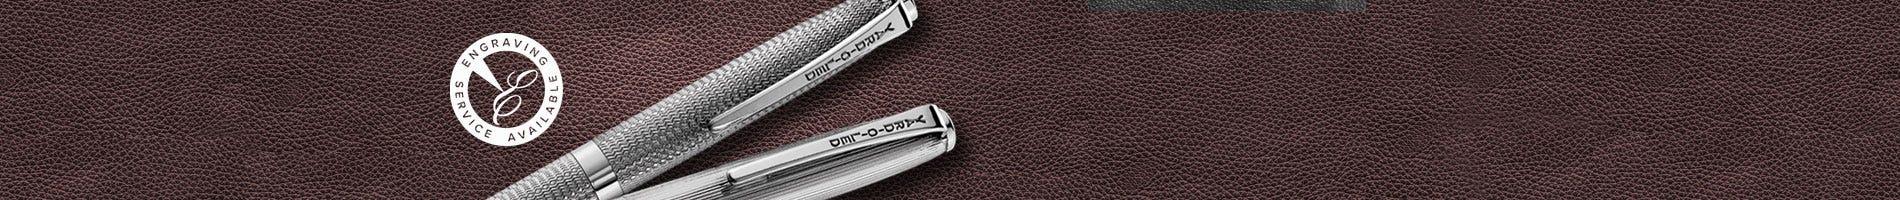 yard-o-led victorian pencil